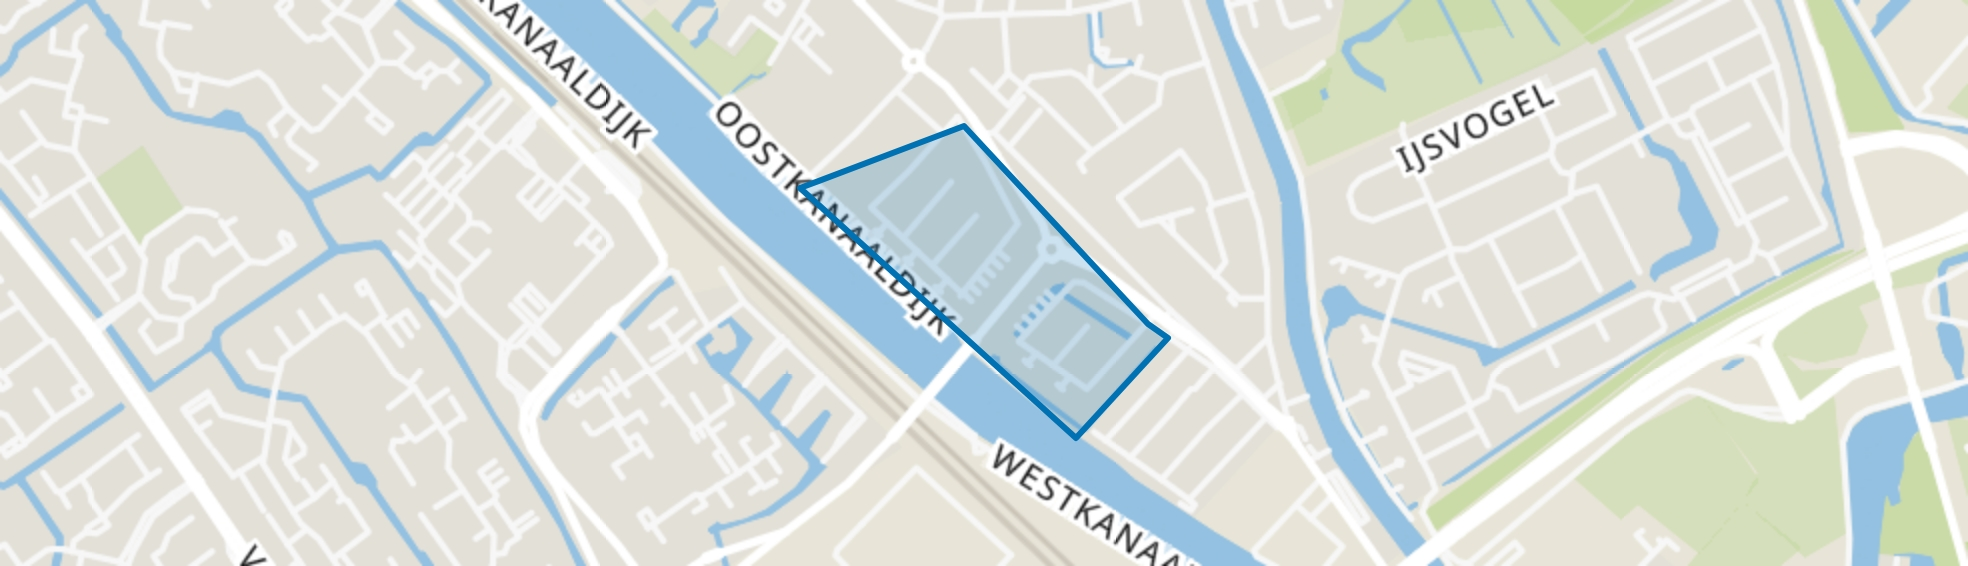 Hogebrug, Maarssen map